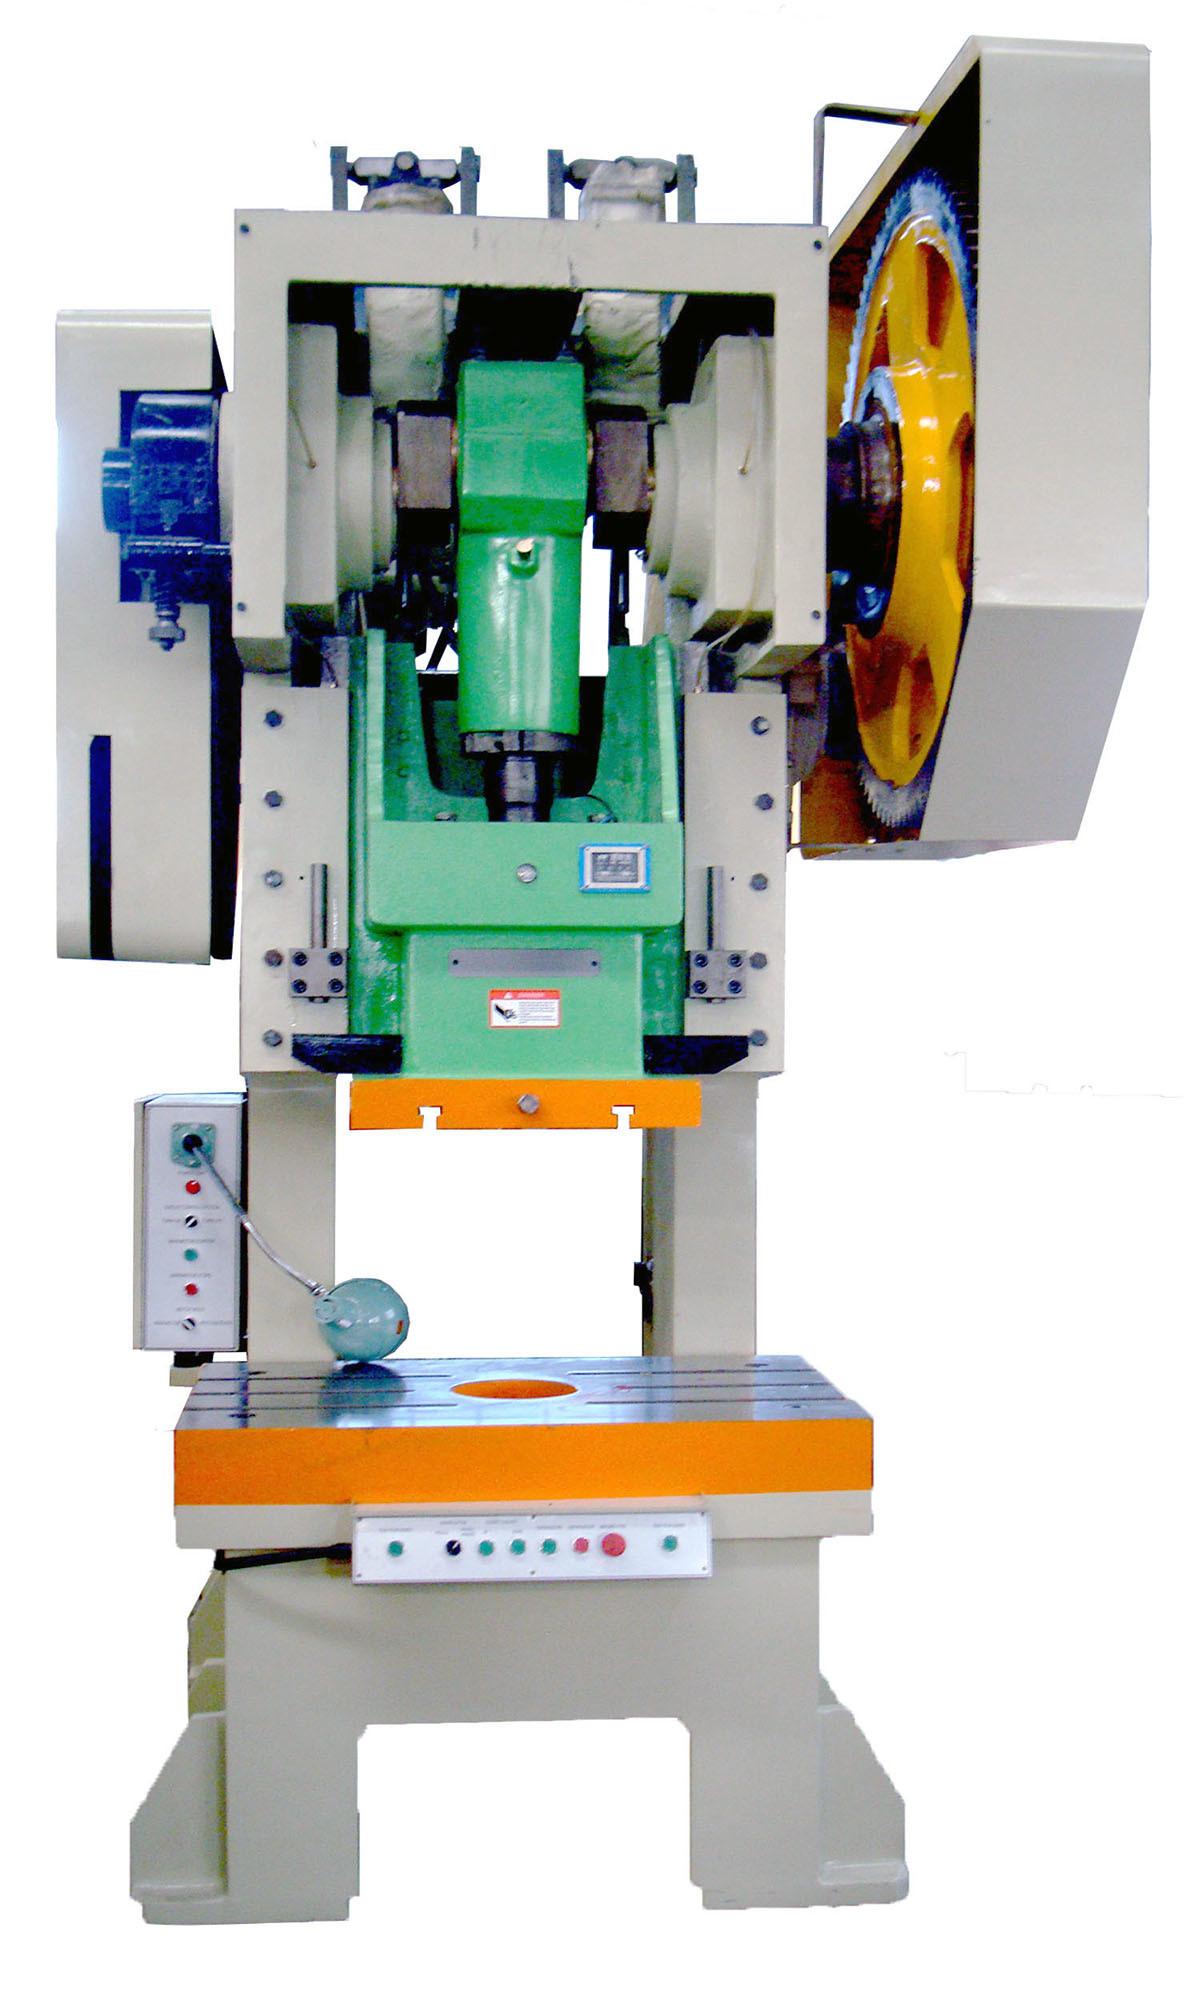 [Hot Item] Die Cutting Hole Punch Press, Die Punch Press